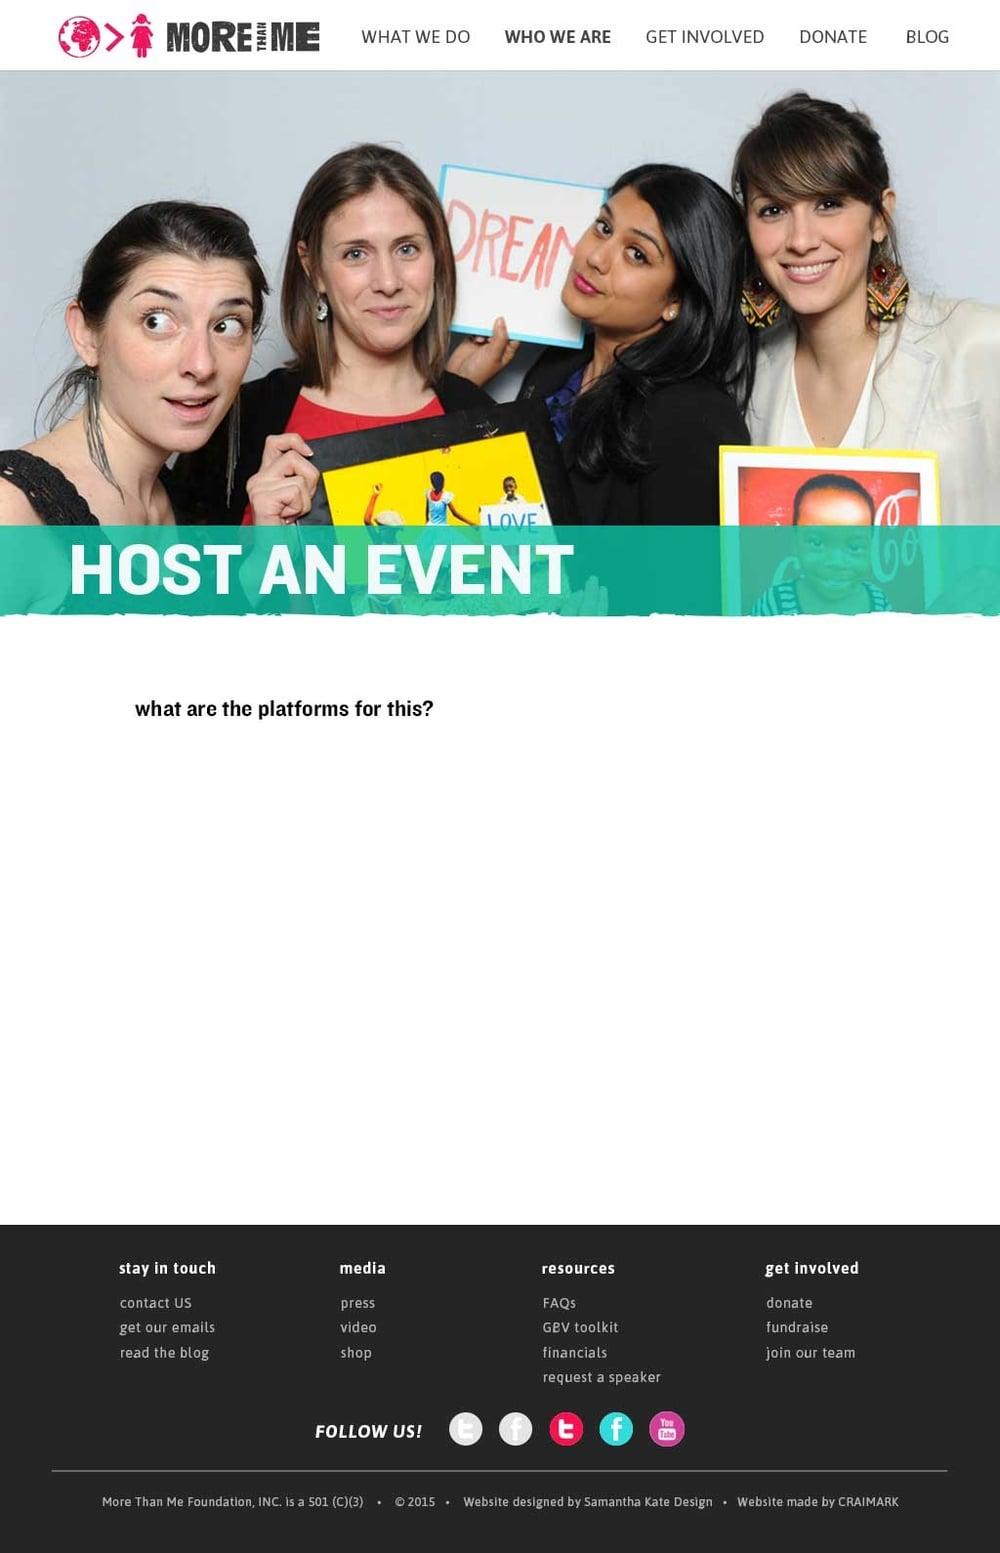 MTM_web-responsive_host-event.jpg